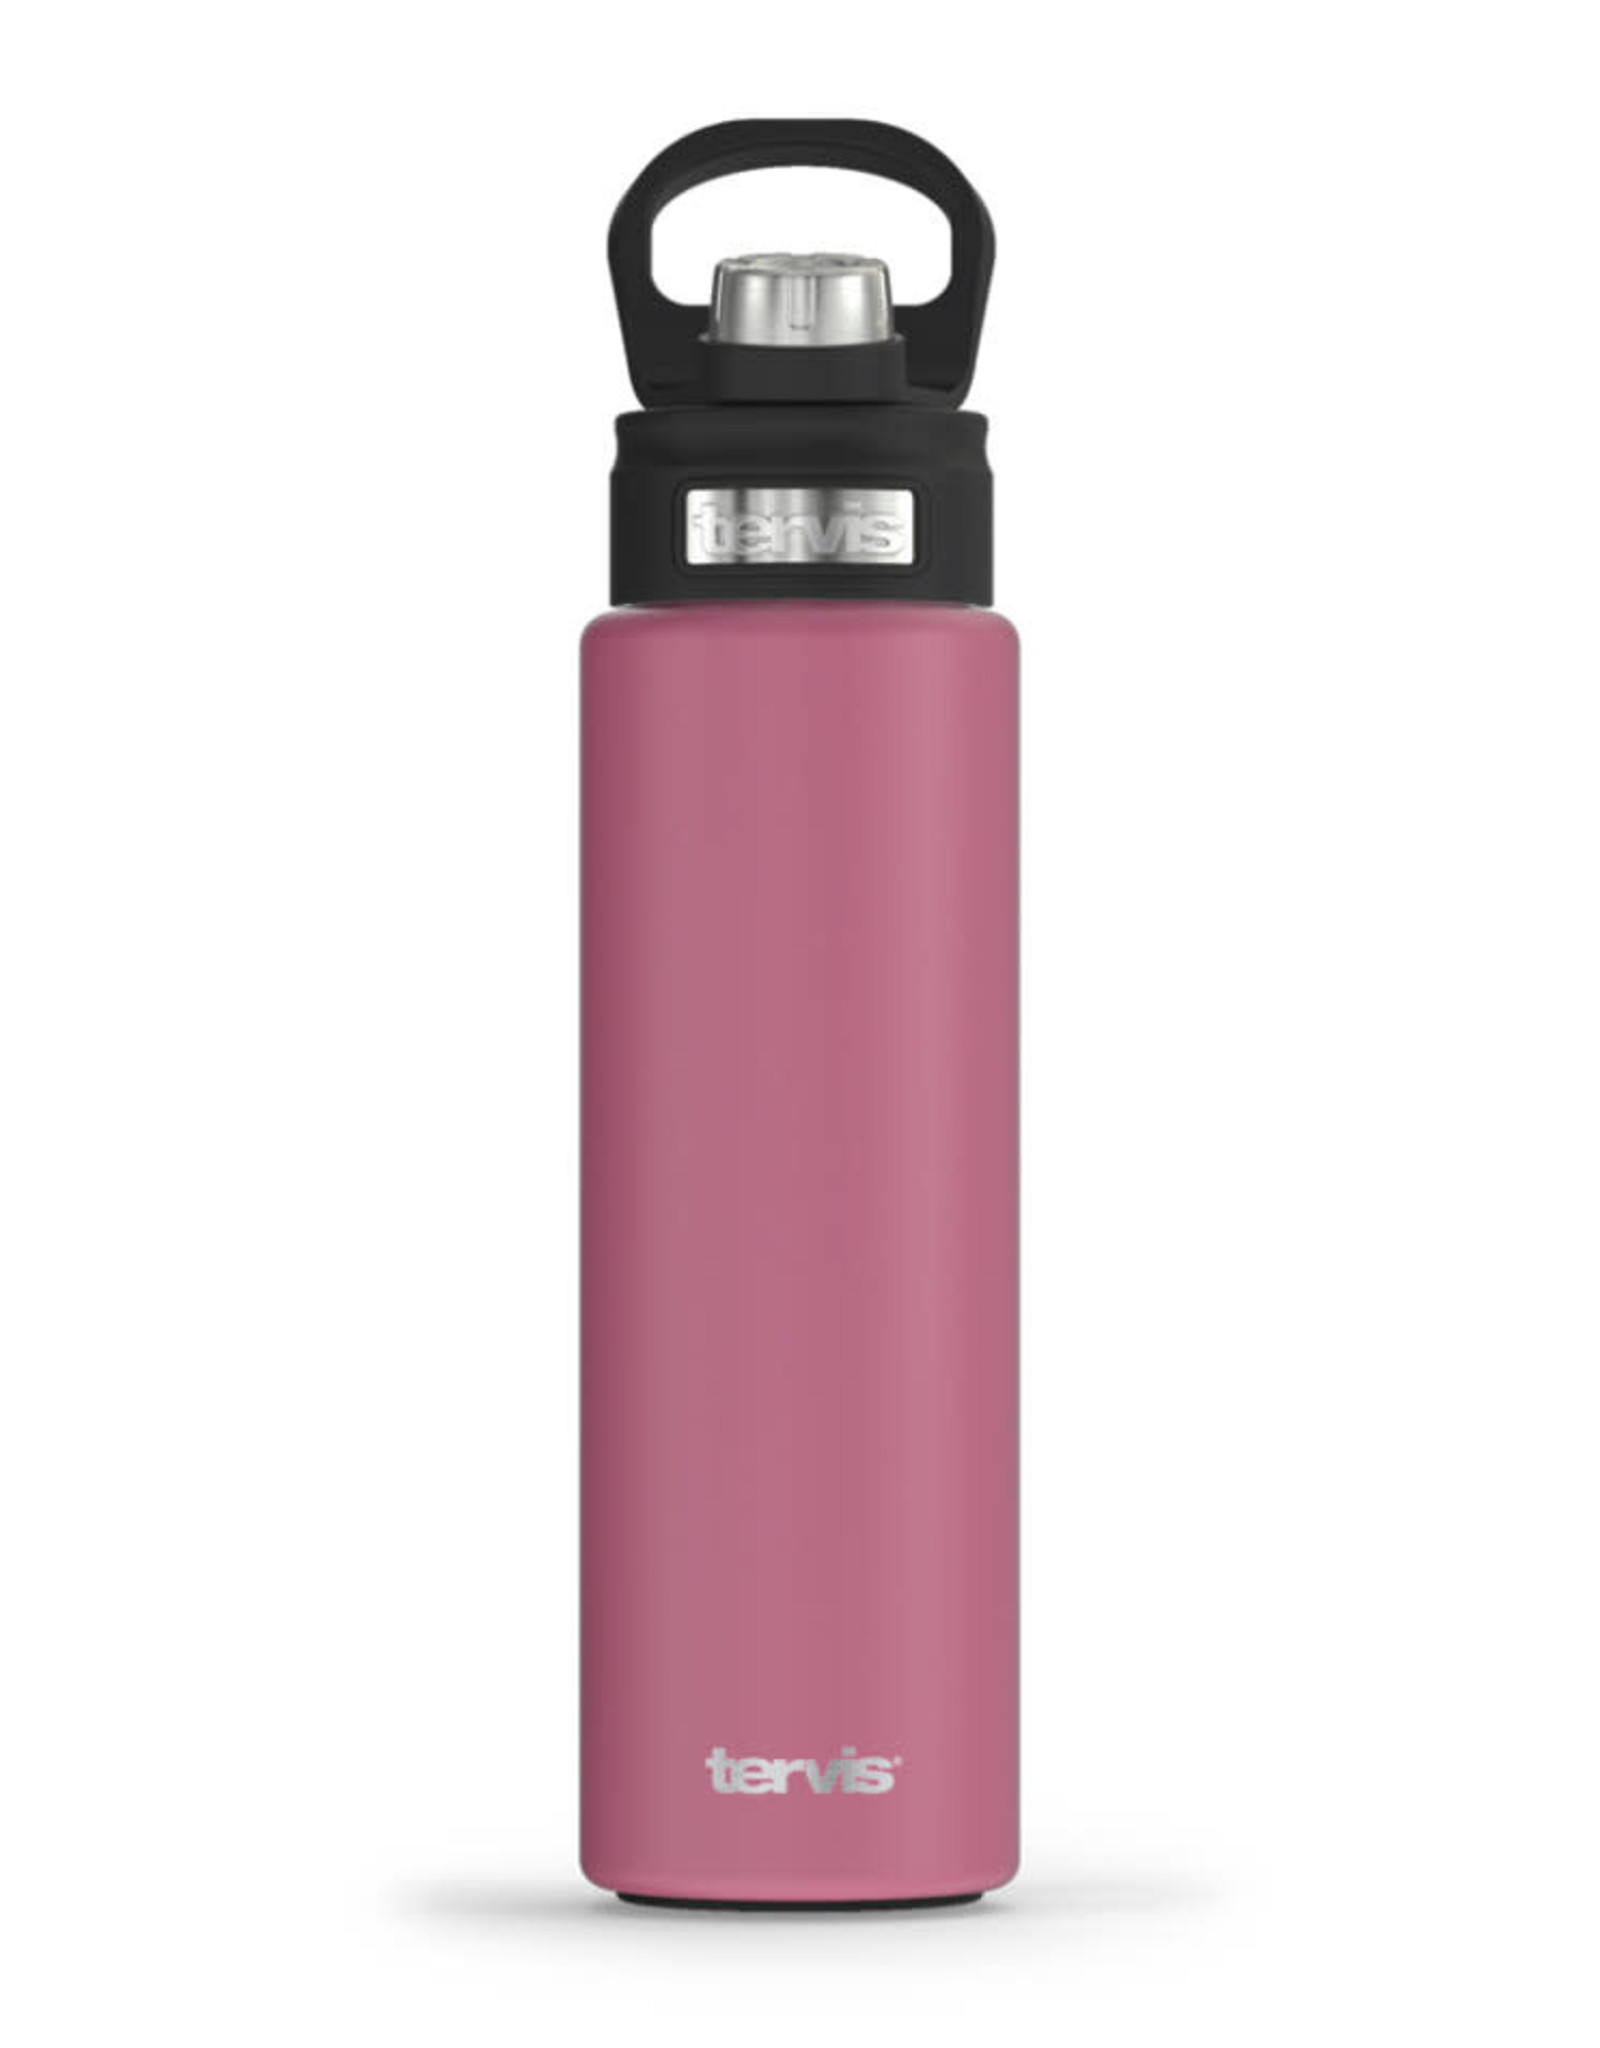 Tervis Tumbler 24oz Stainless Water Bottle Elderberry Powder Coated